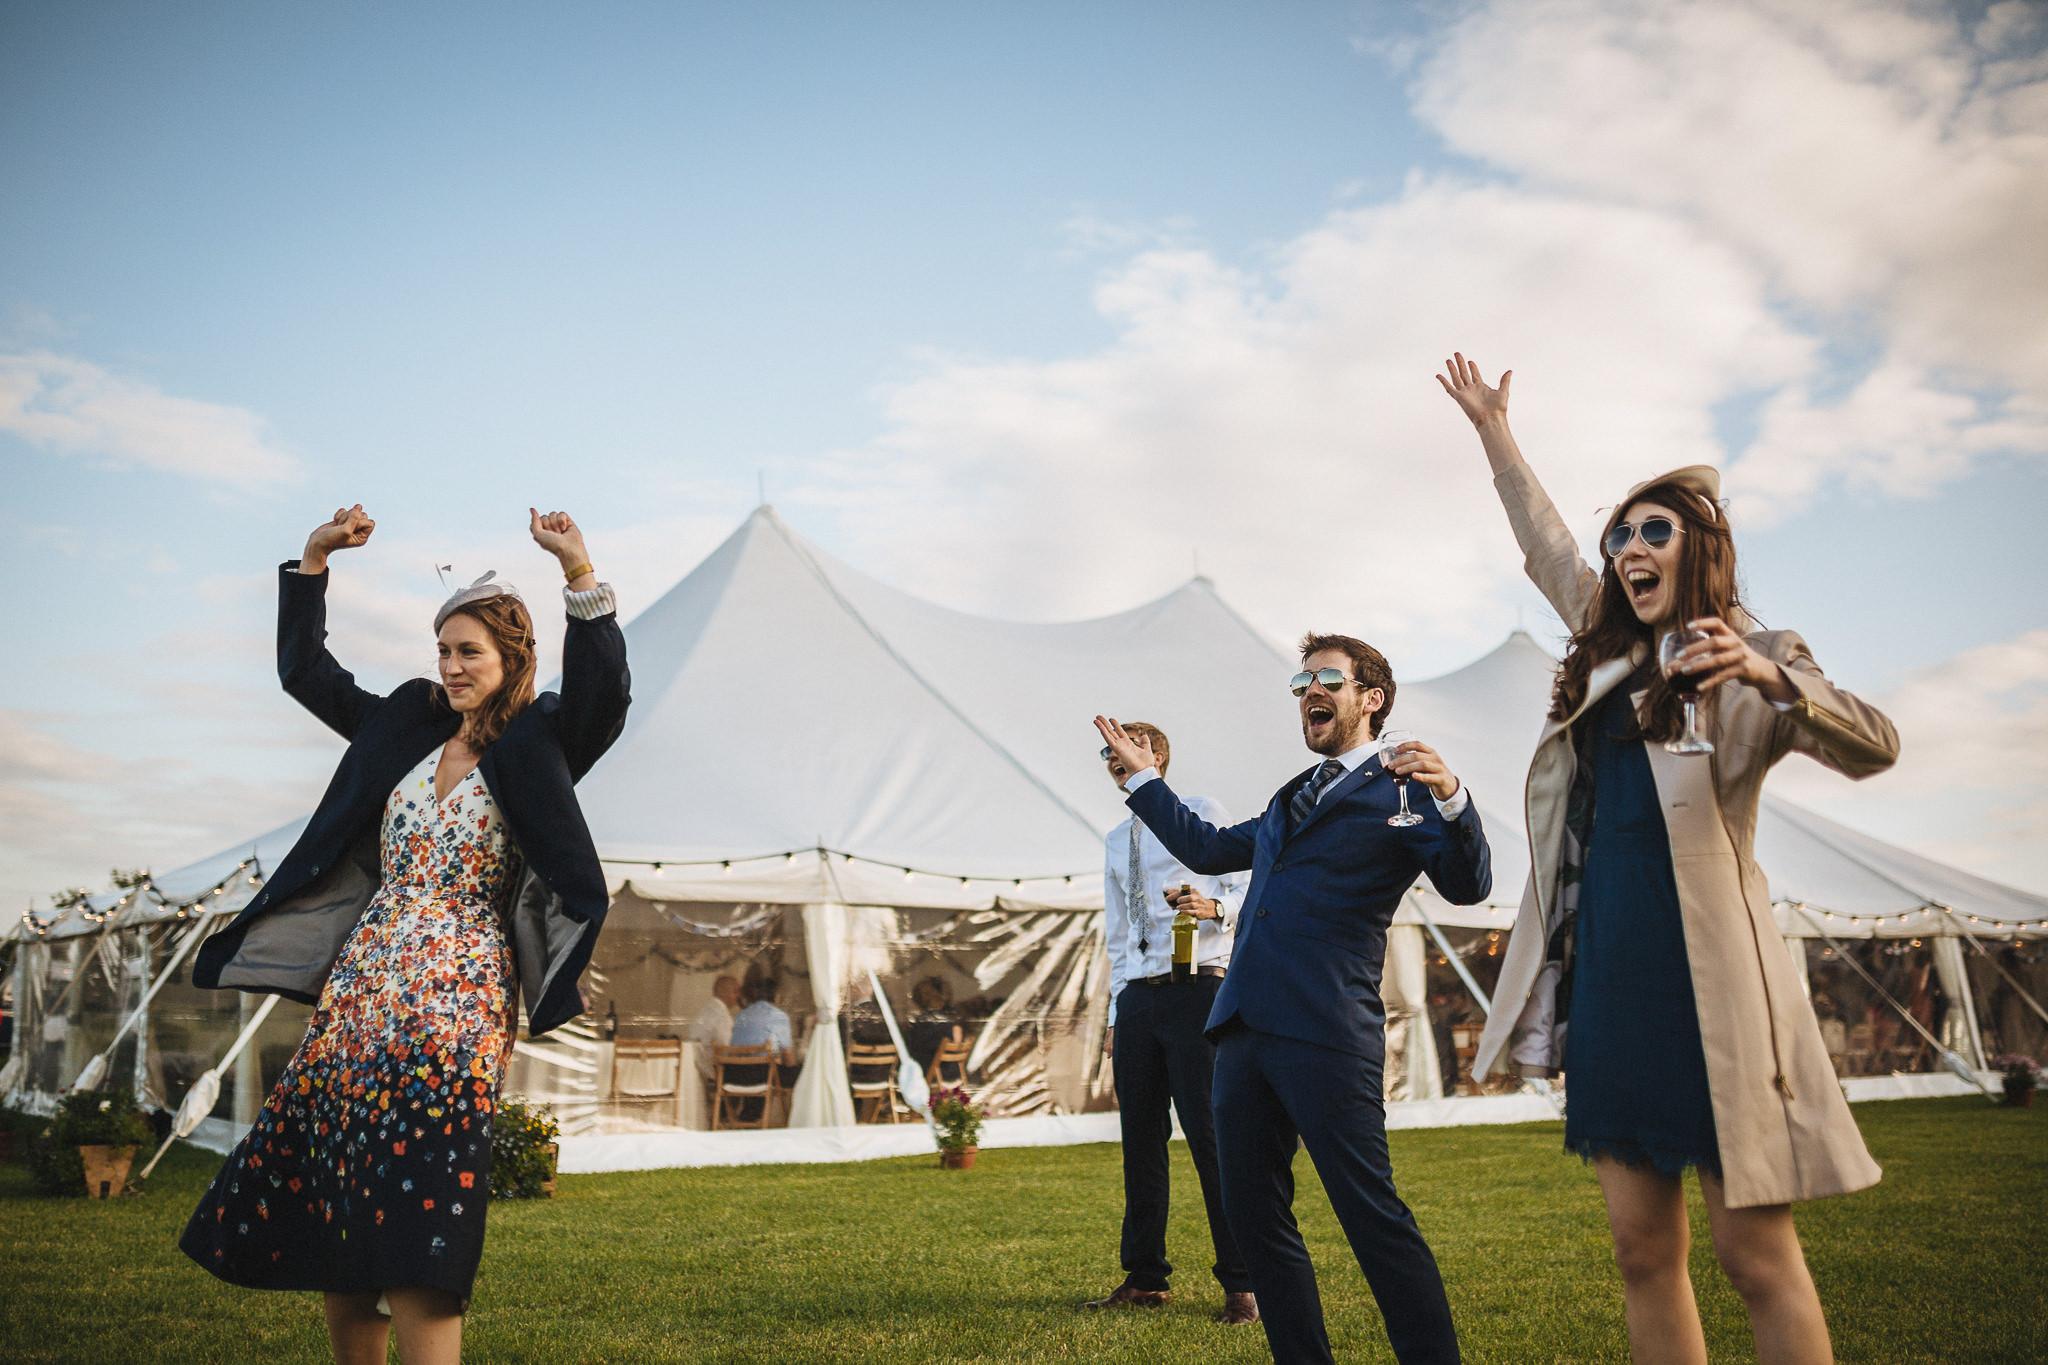 paul-marbrook-Farm-Wedding-Photographer-Lancashire-90081